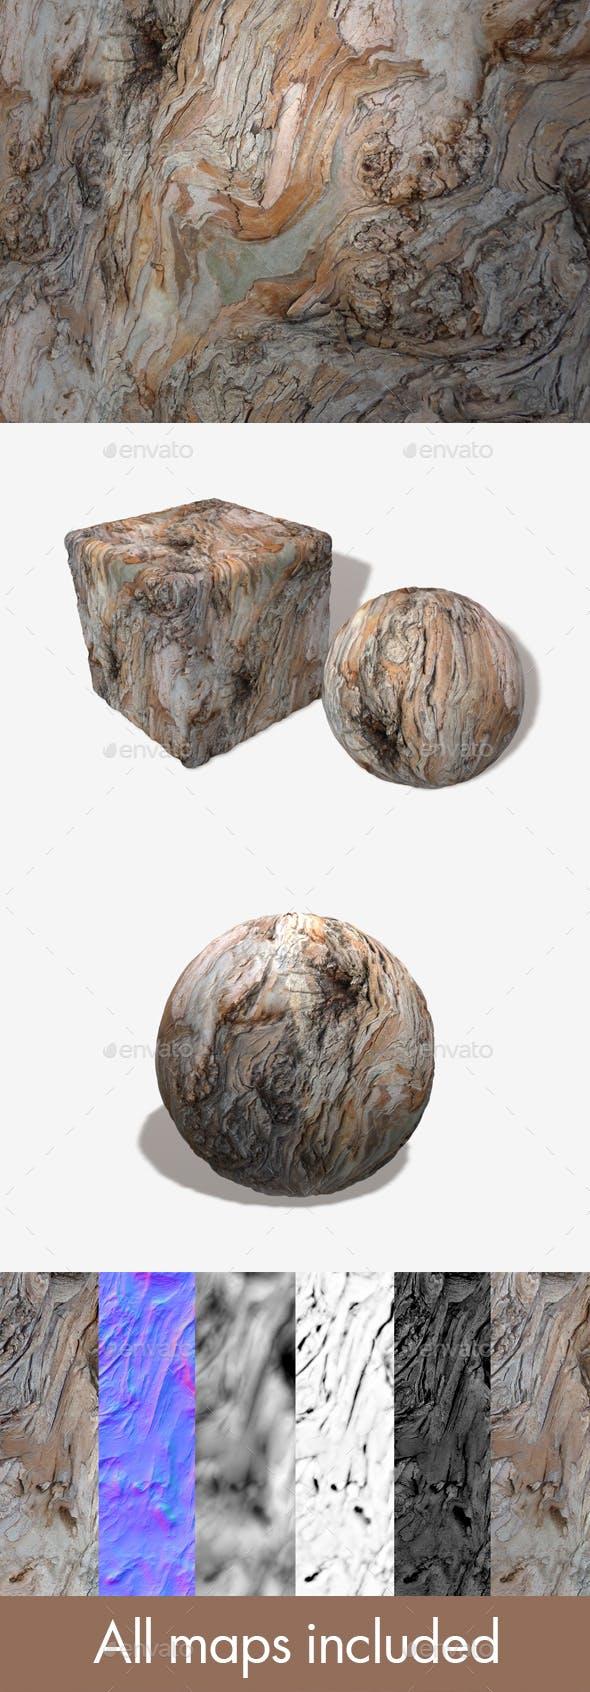 Wavy Bark 3 Seamless Texture - 3DOcean Item for Sale